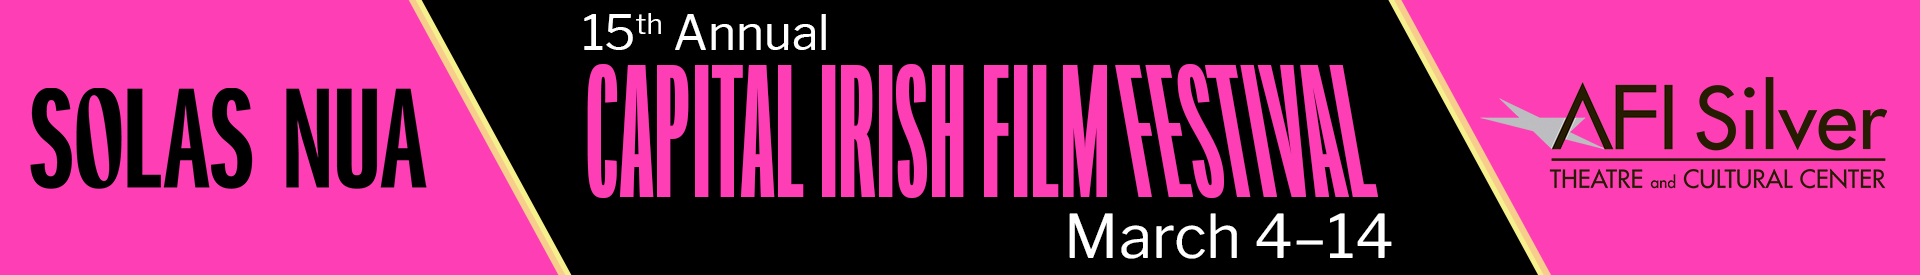 Capital Irish Film Festival